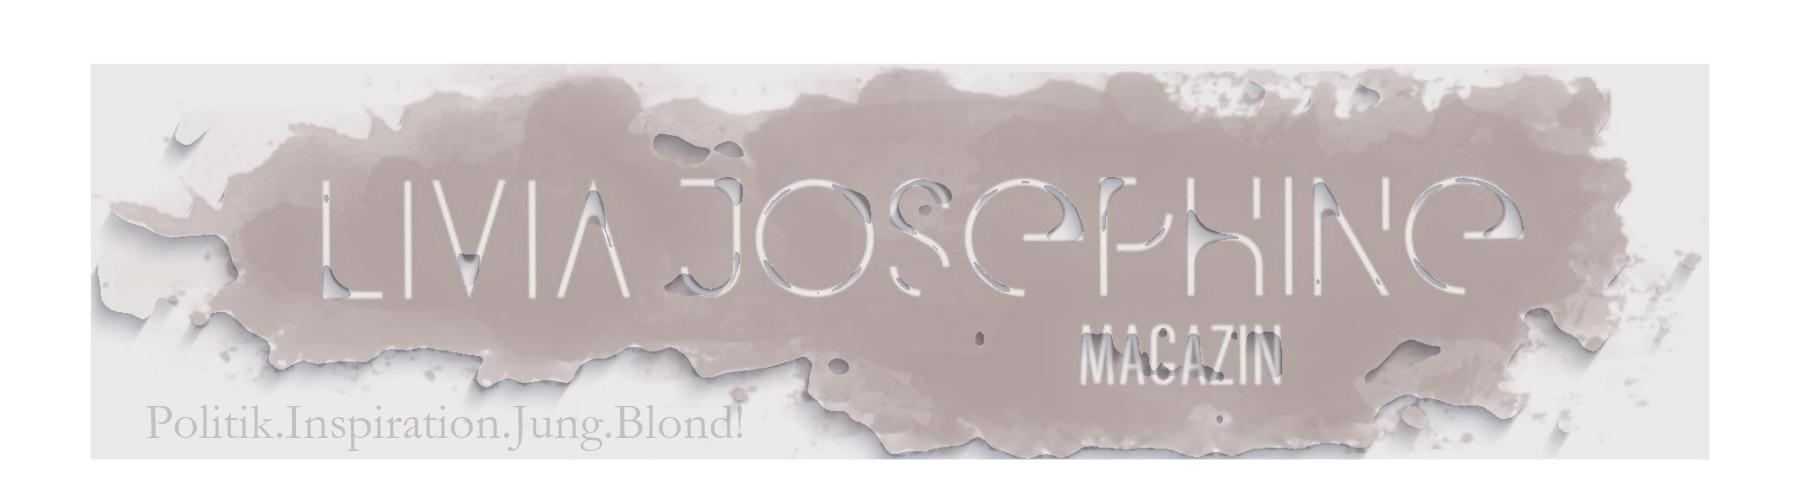 Livia Josephine Magazin